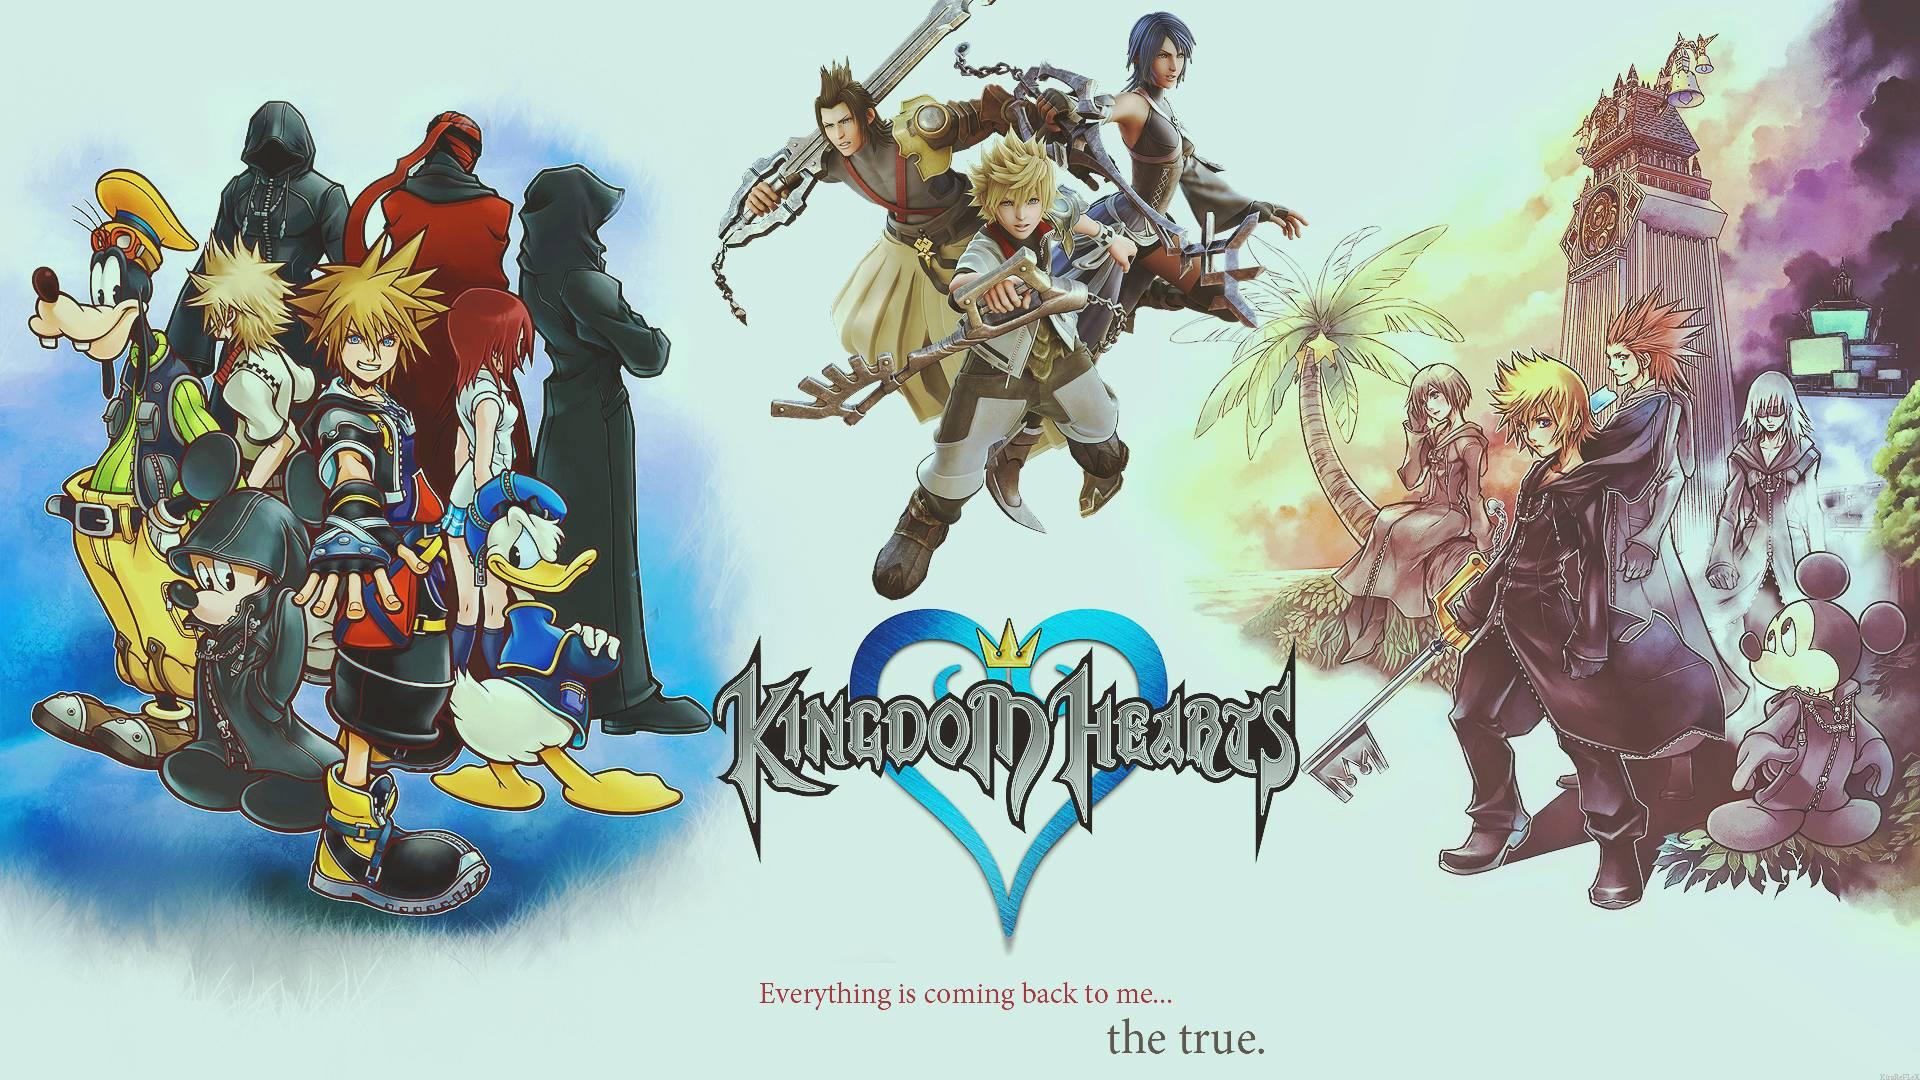 Simple Wallpaper Mac Kingdom Hearts - kingdom-hearts-hd-wallpapers-5  Image_32457.jpg